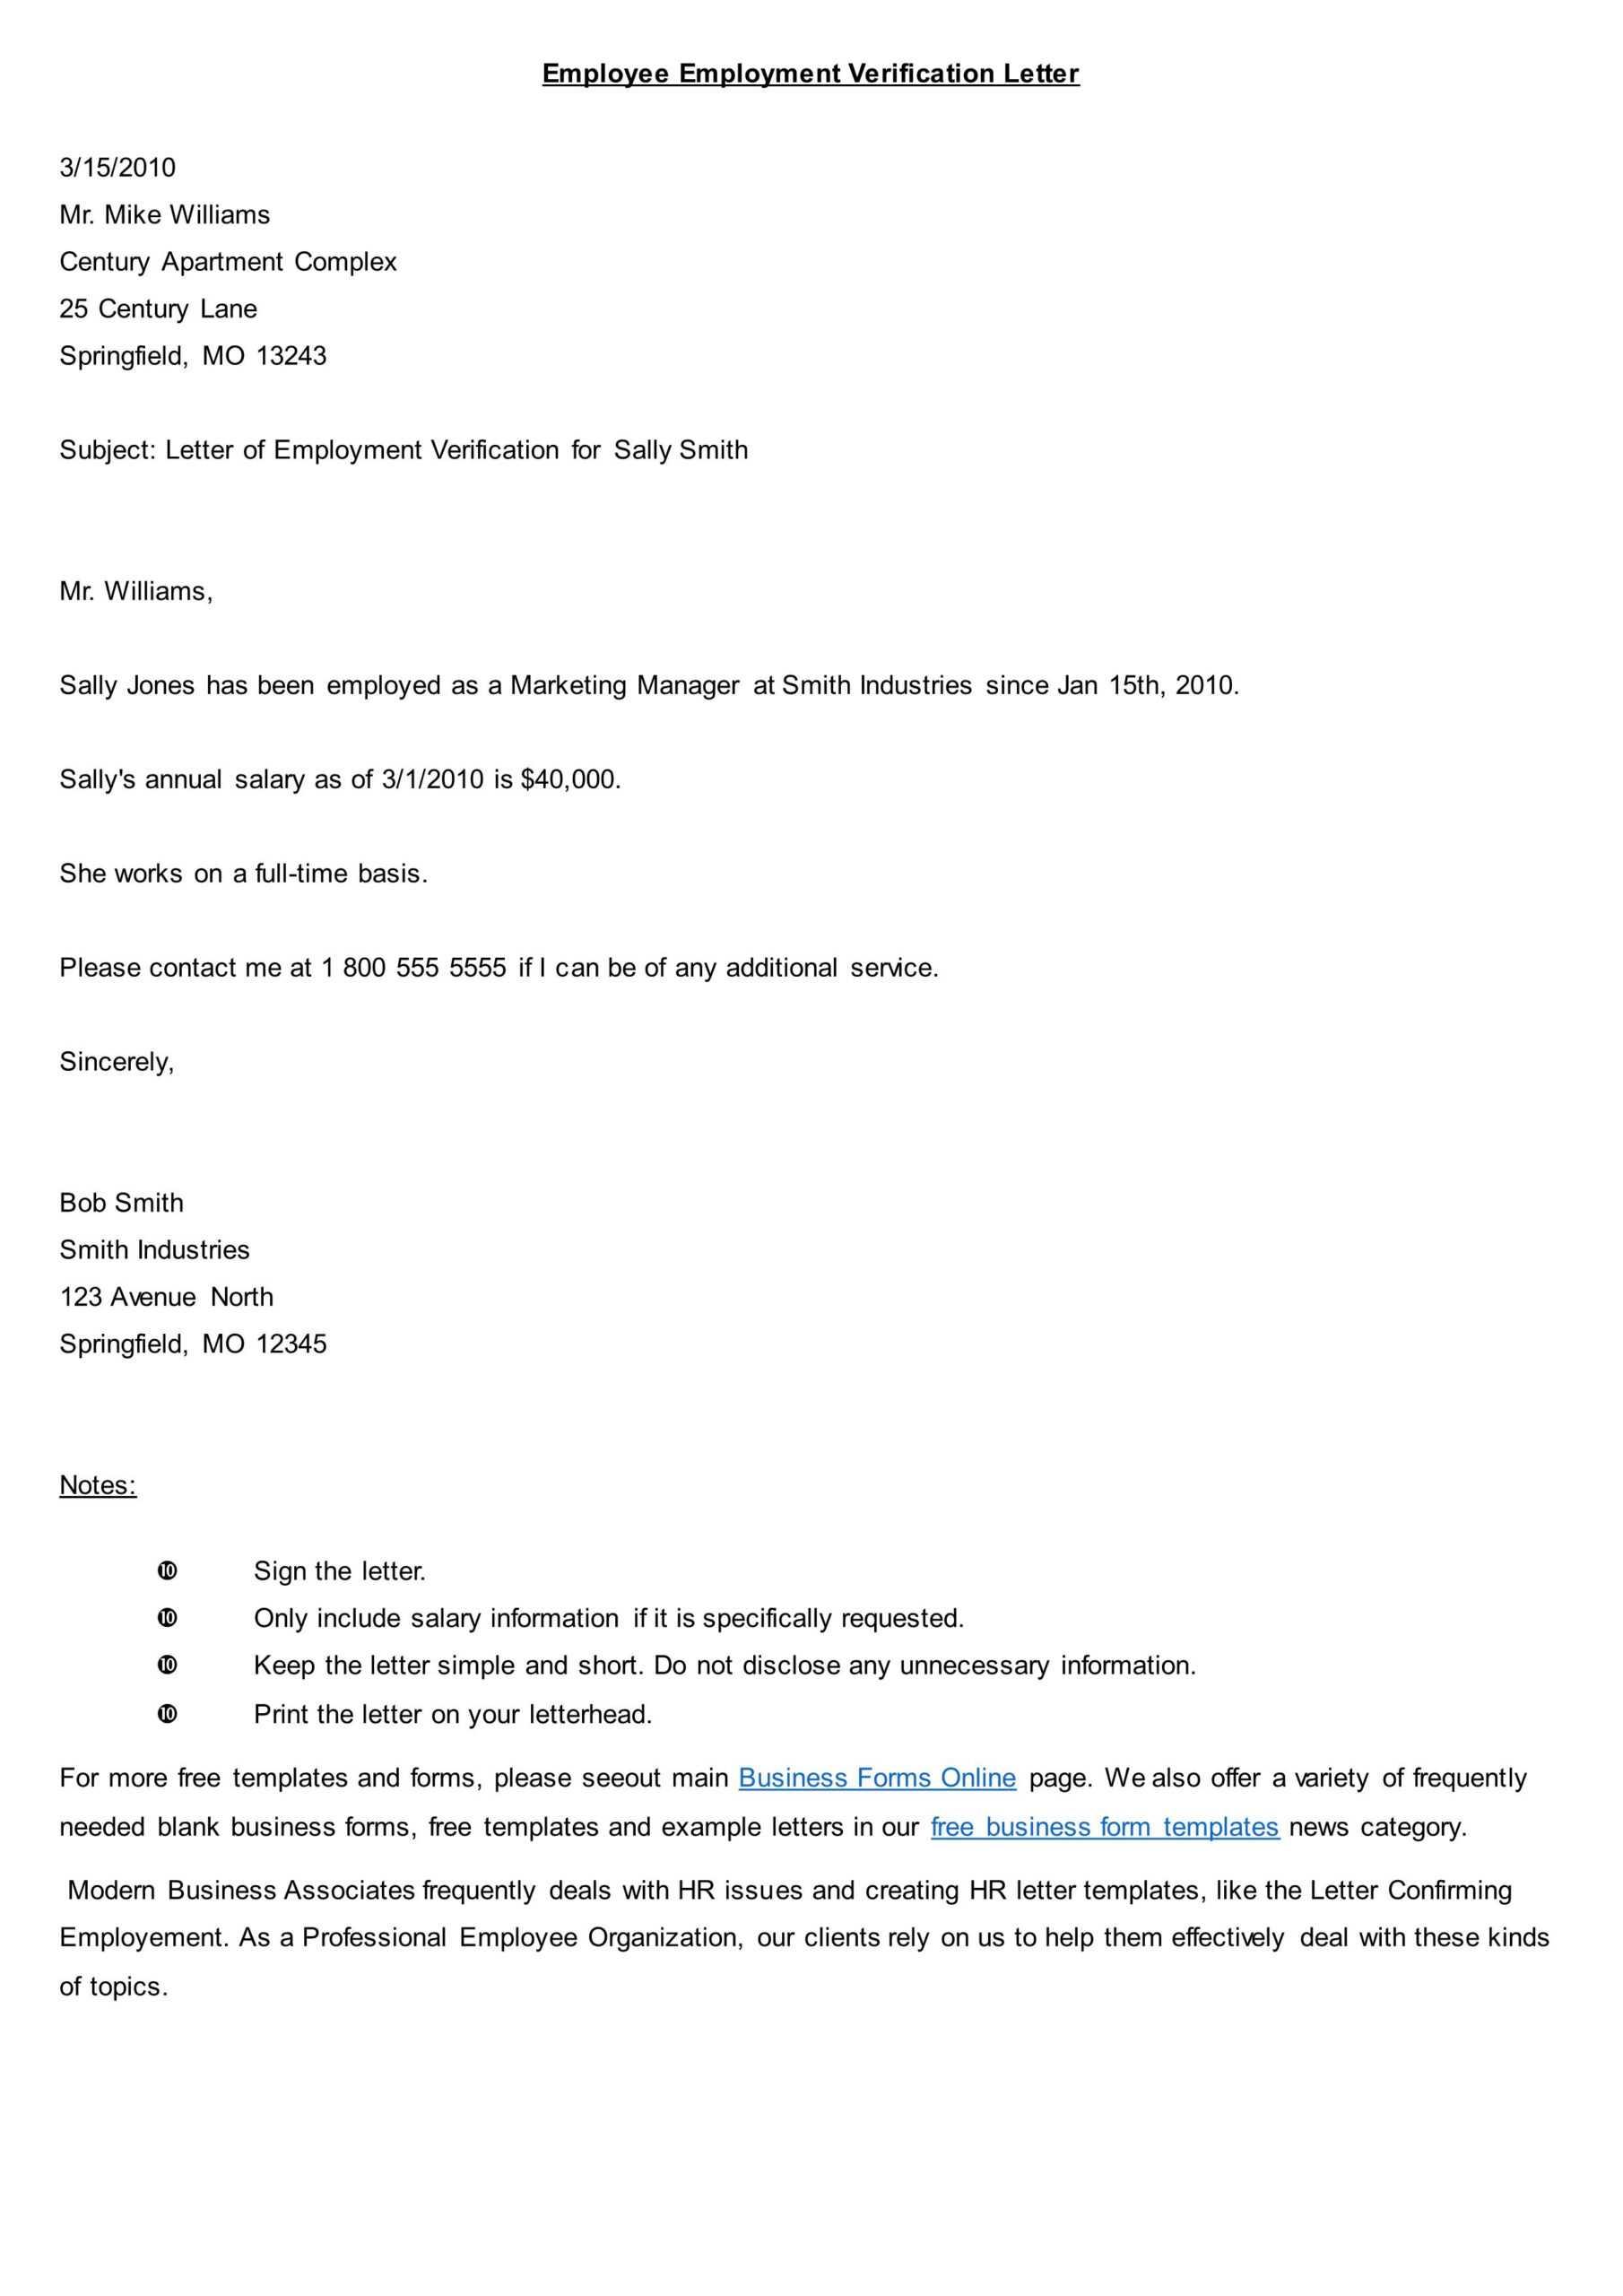 Top 10 Employment Verification Letter Form Template Intended For Employment Verification Letter Template Word